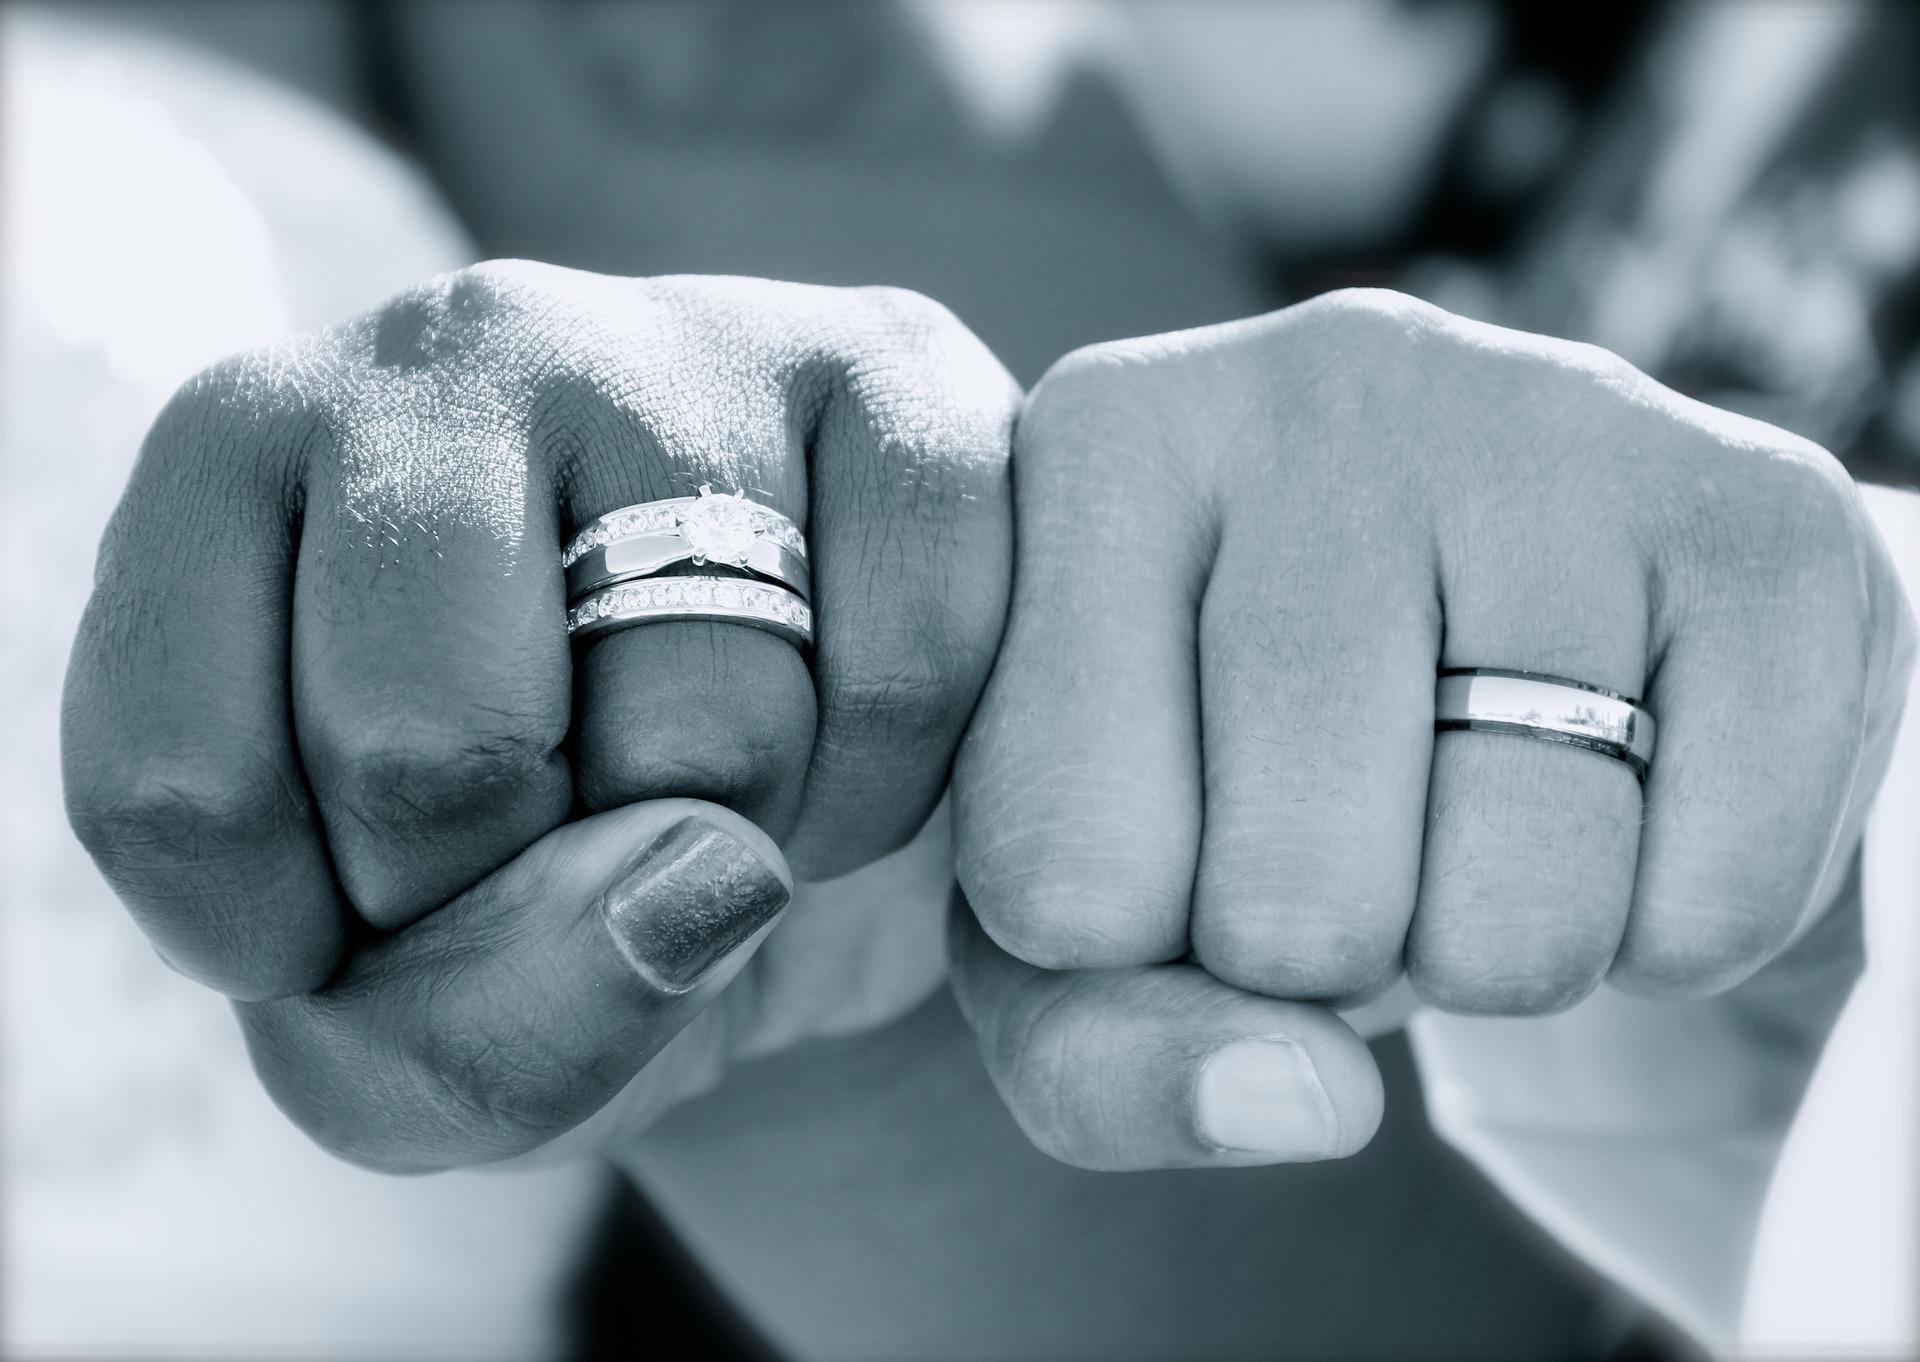 Mariage en pause